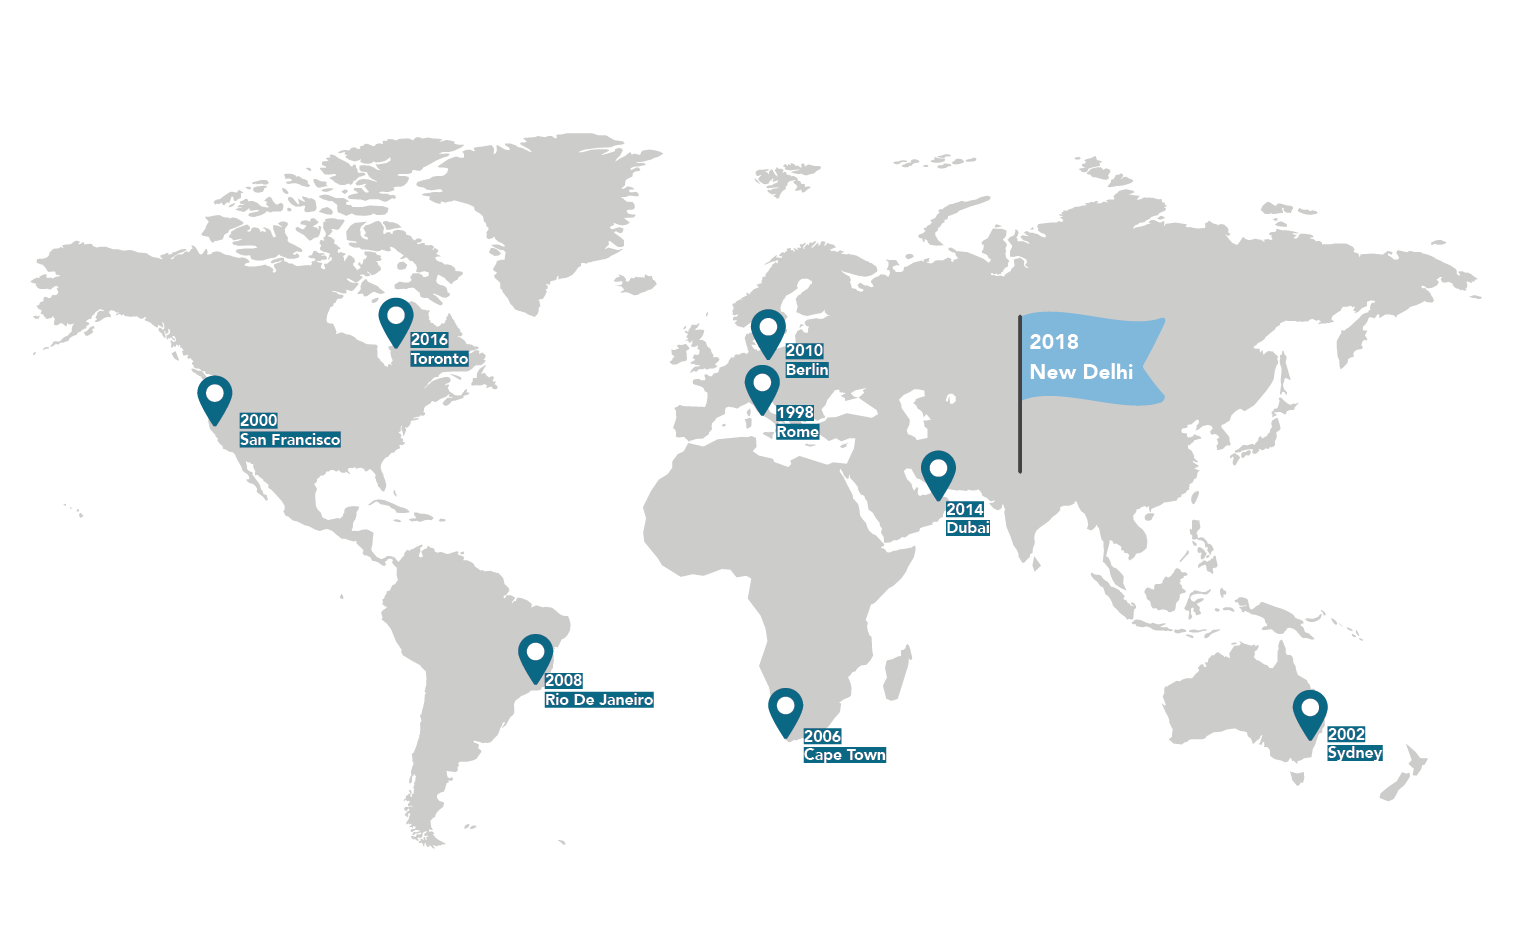 2018 WCCRC History Map v2